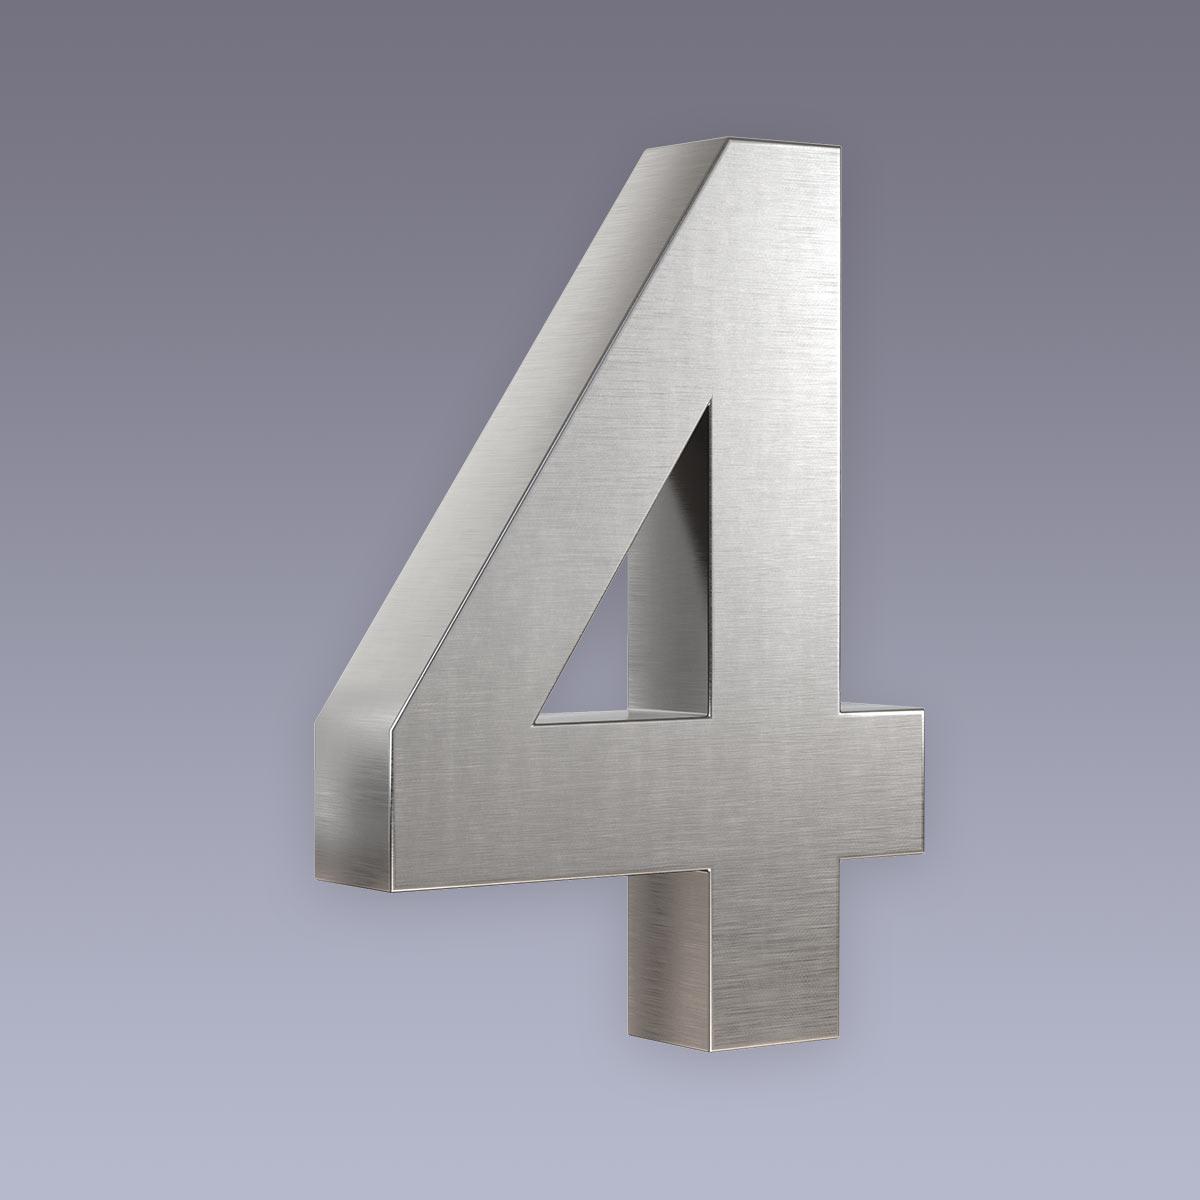 3D Hausnummer 4 Edelstahl in 3D Design Arial V2A